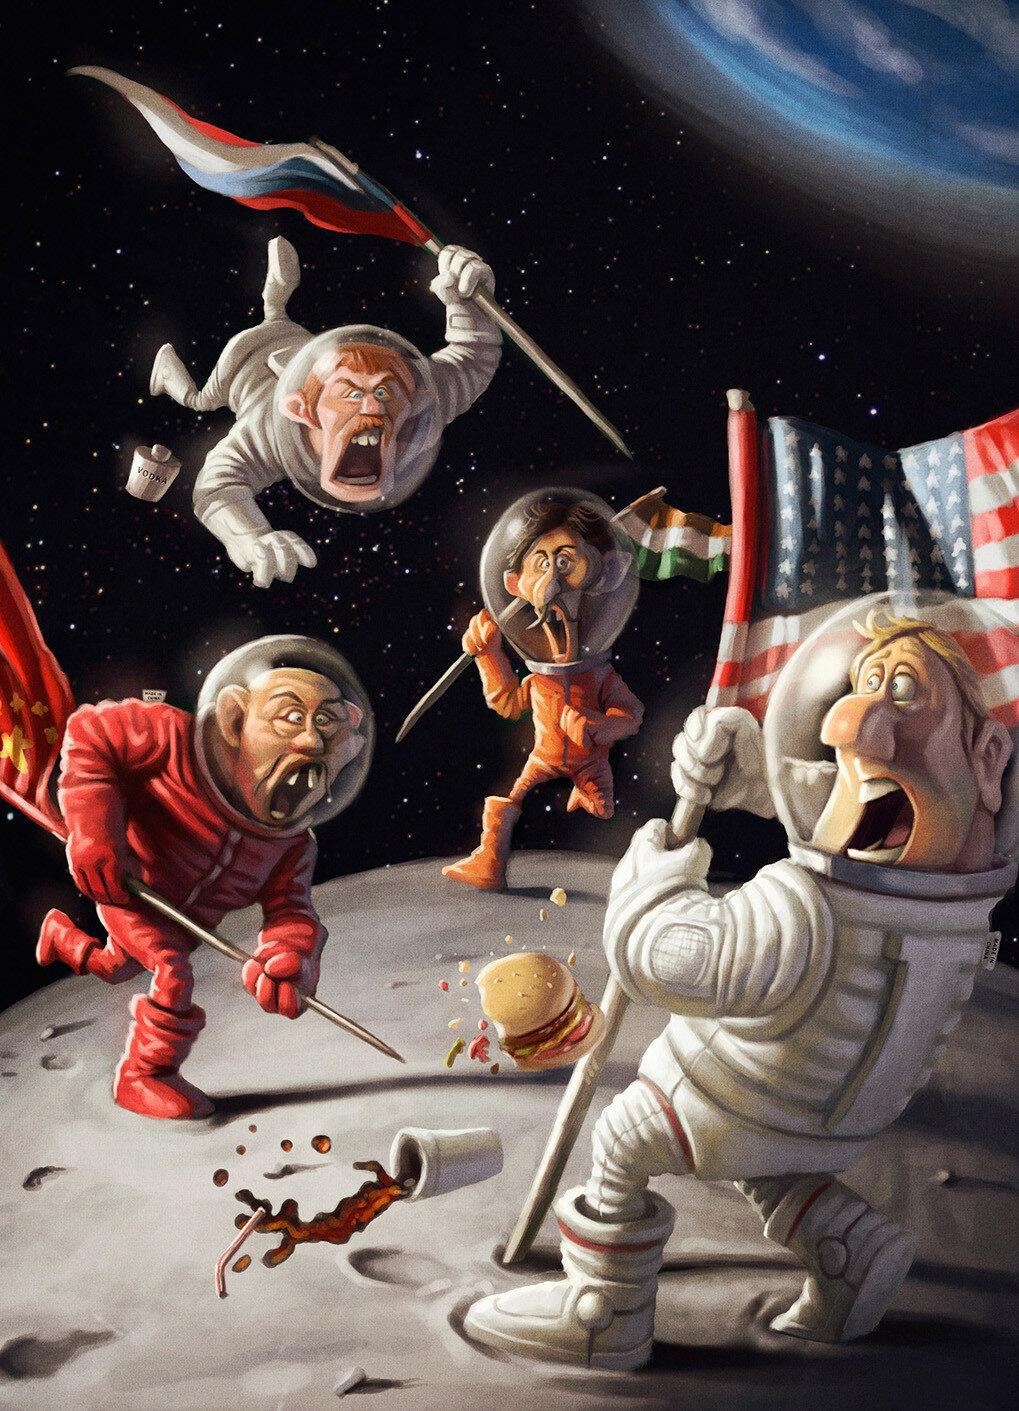 Приколы про космос картинки, бодрого